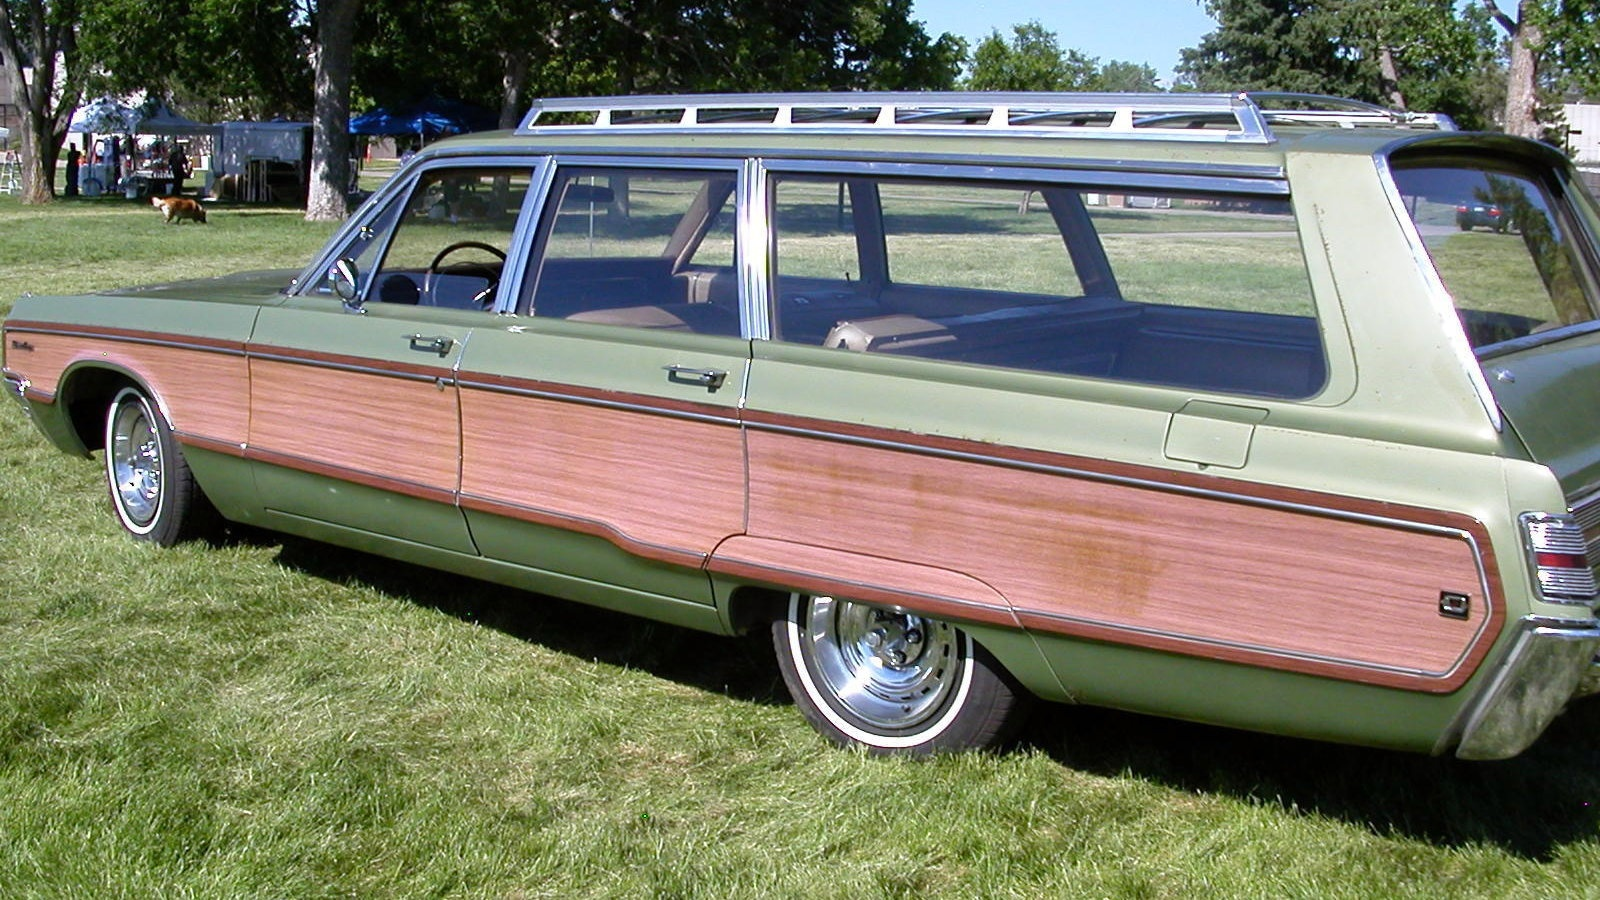 hot family hauler 1968 chrysler newport t c. Black Bedroom Furniture Sets. Home Design Ideas